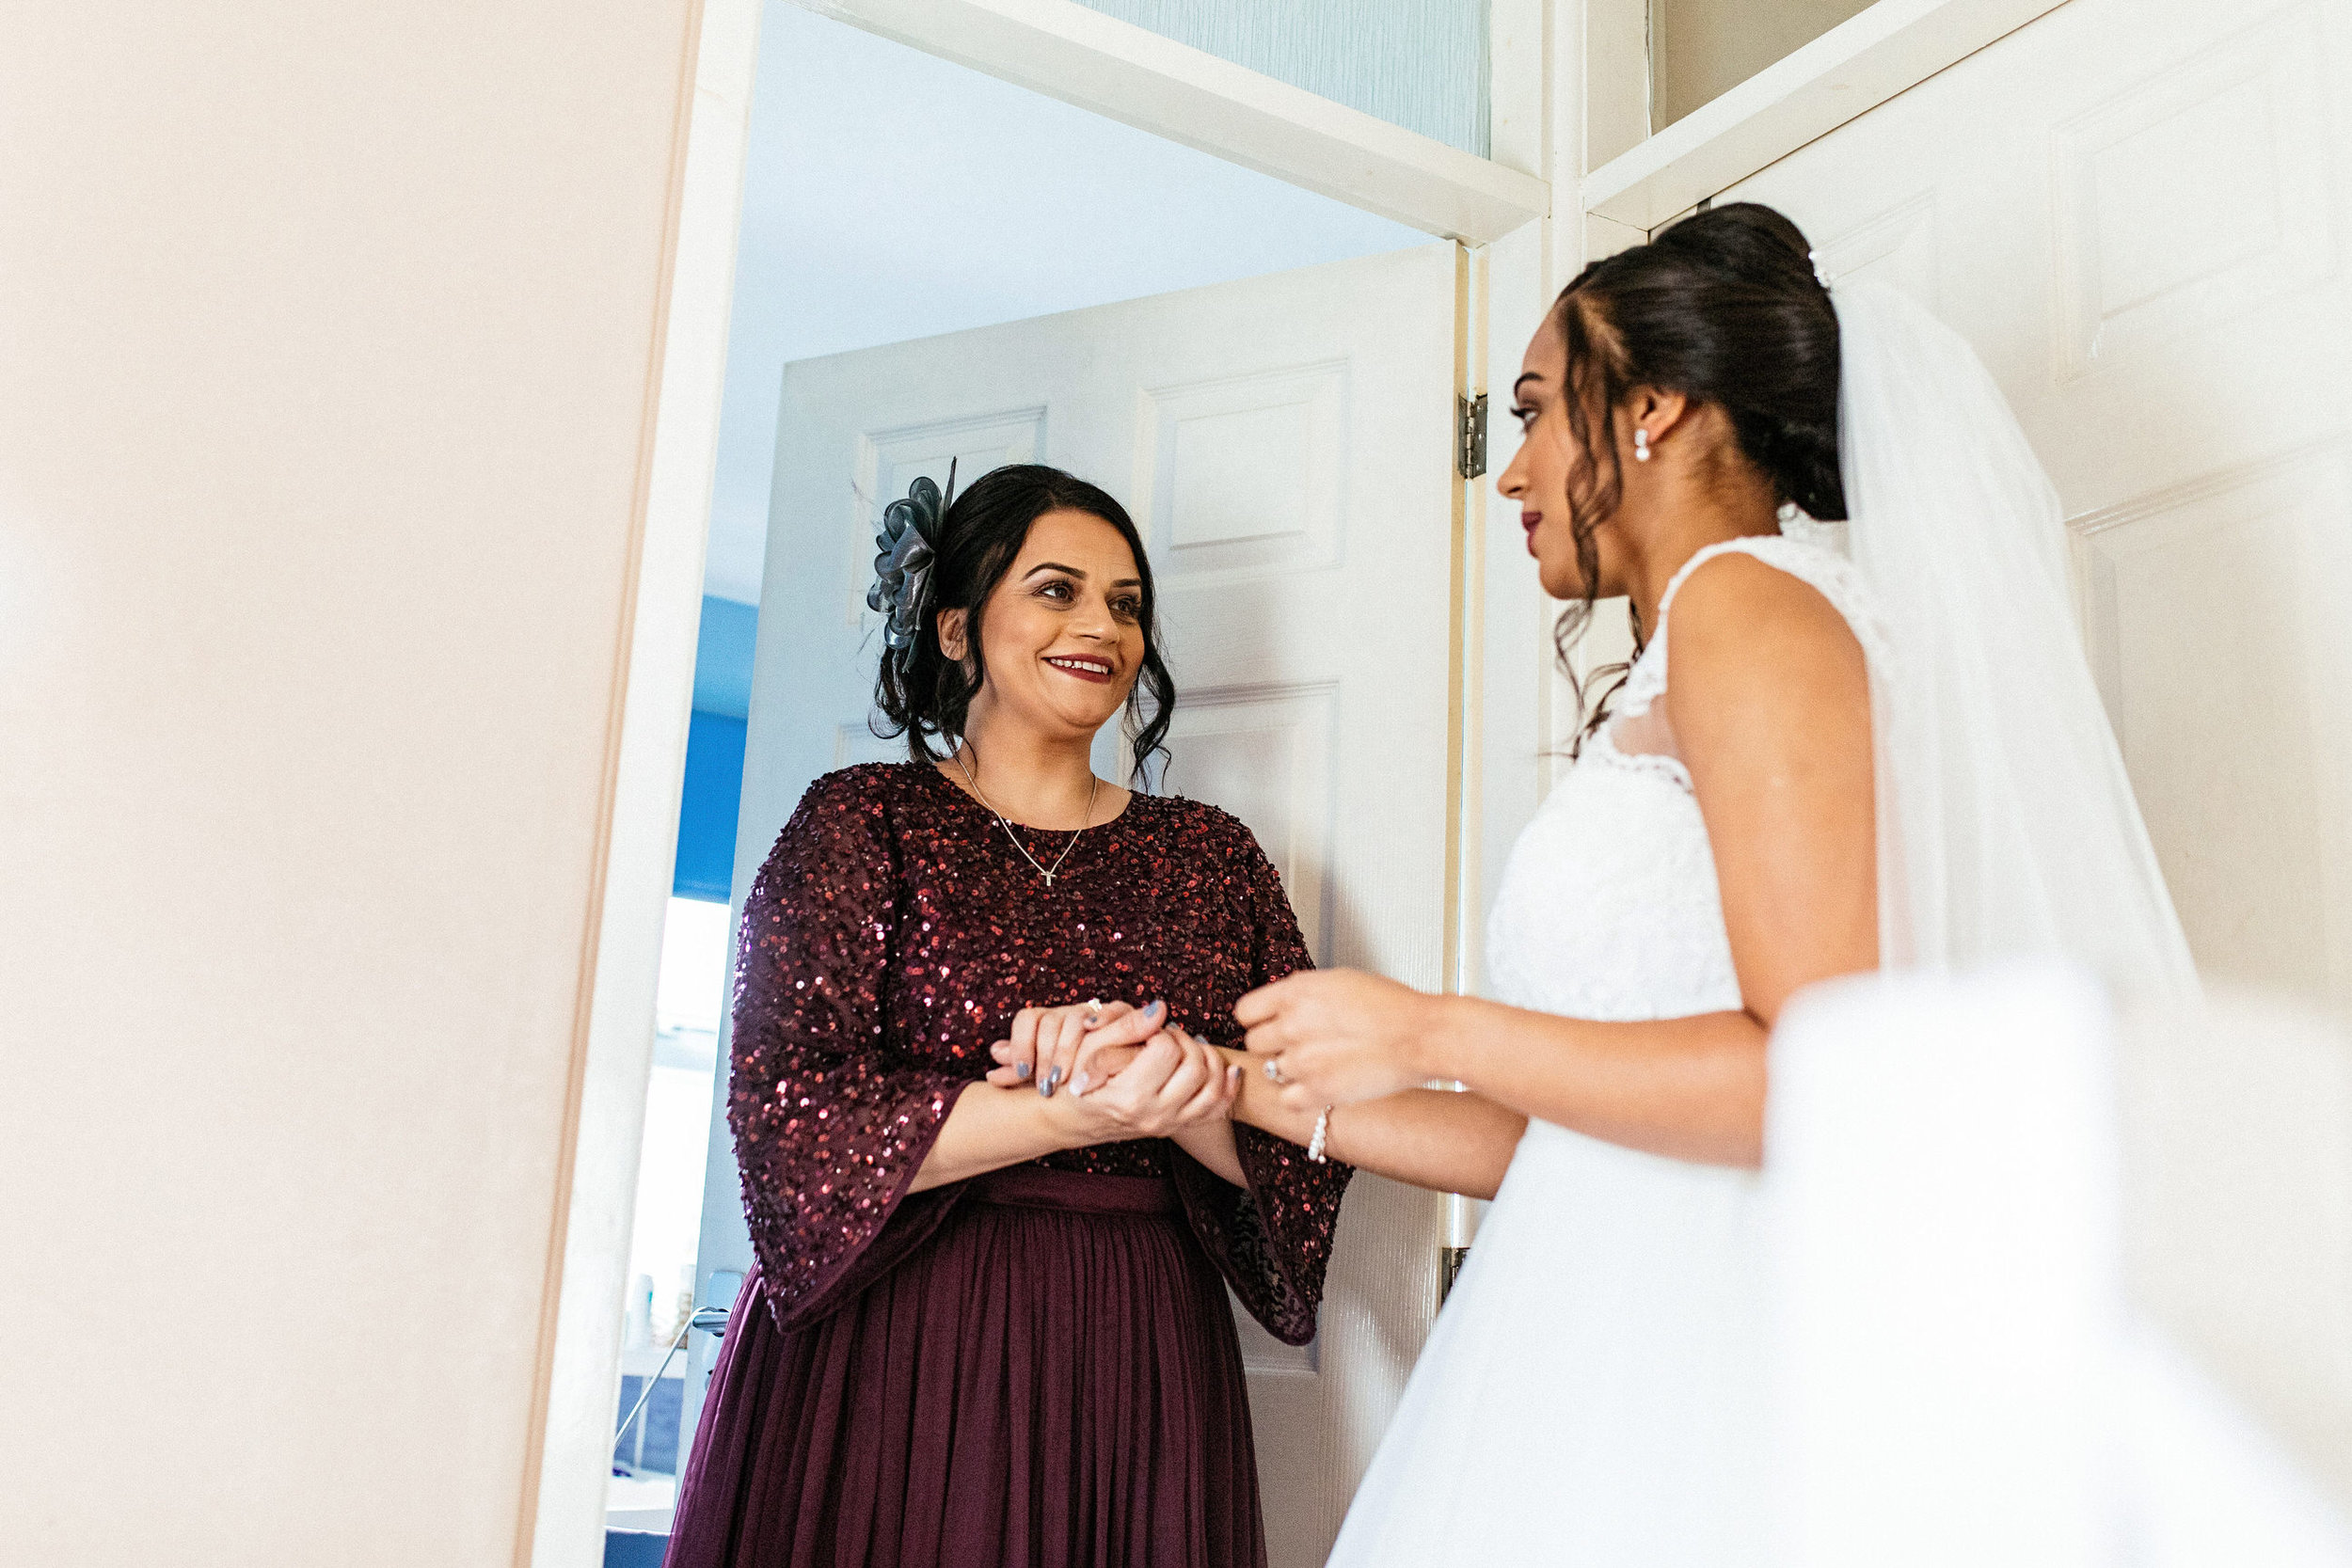 The-Bond-Company-Wedding-Photography-10-1.jpg